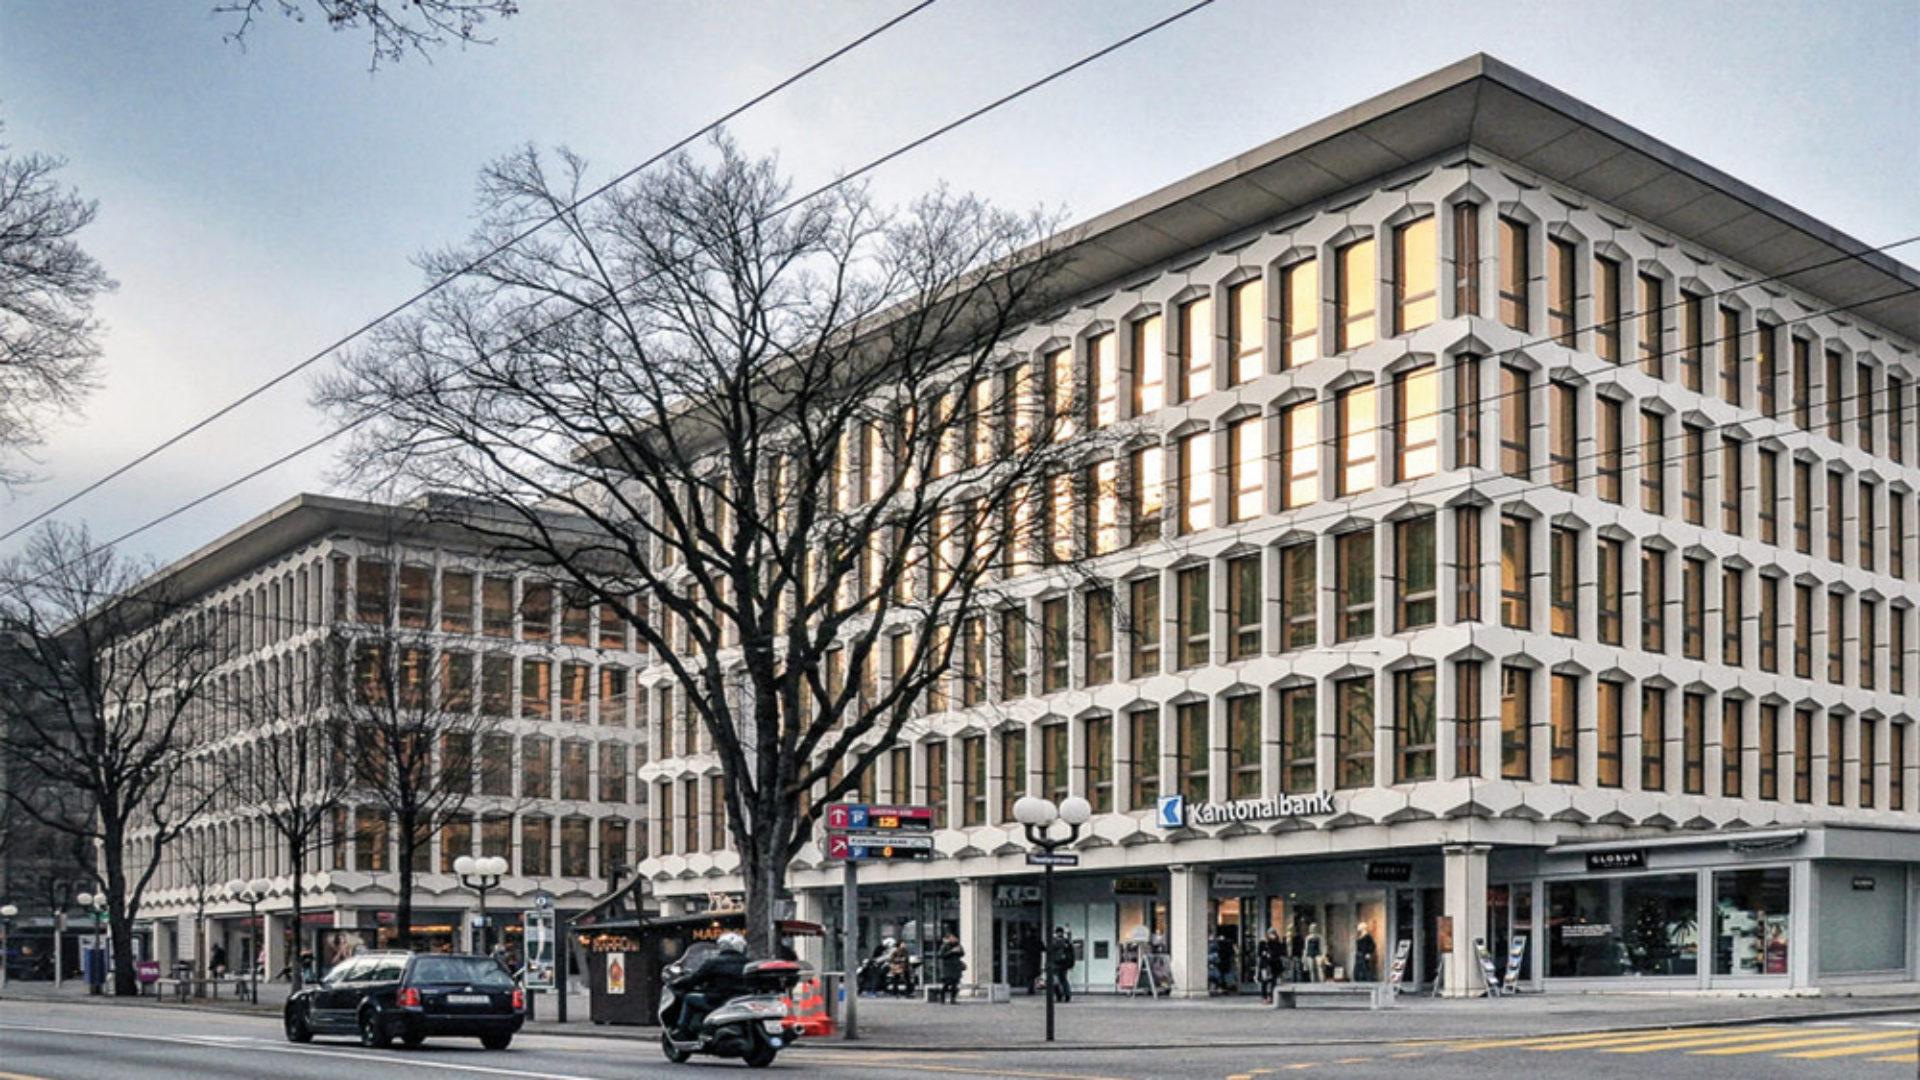 Beleuchtung_referenz_objekt_Treppenhausbeleuchtung_Aufbaudeckenleuchten_Luzerner_Kantonalbank_perdix